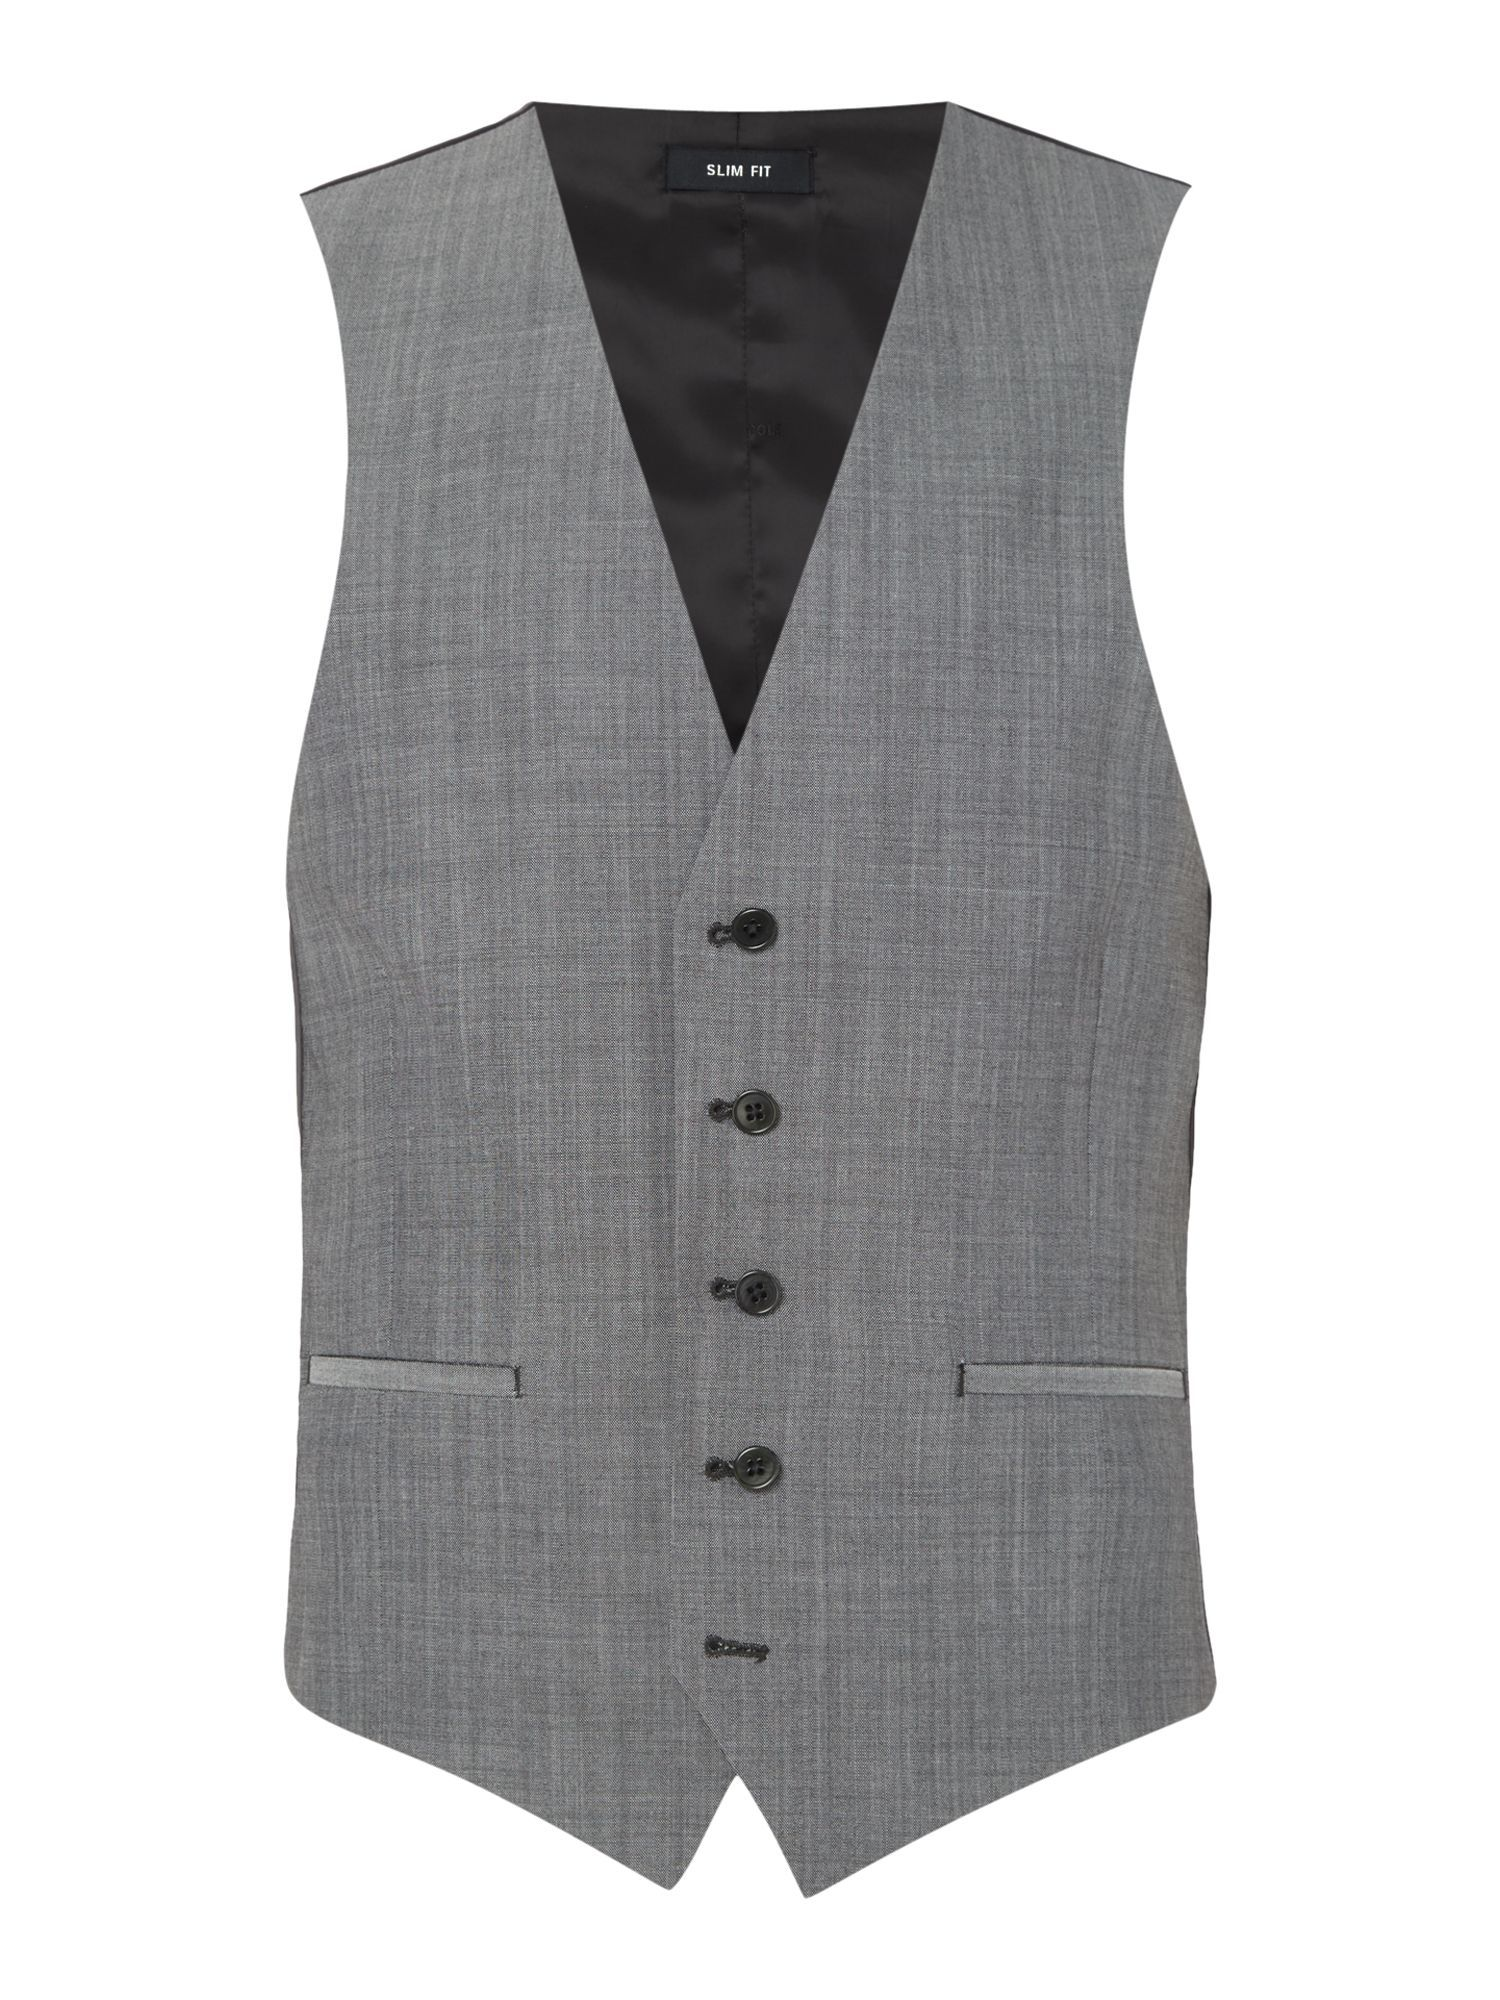 Buy: Men's Kenneth Cole Mercer Slim Fit Tonic Suit Waistcoat, Grey ...